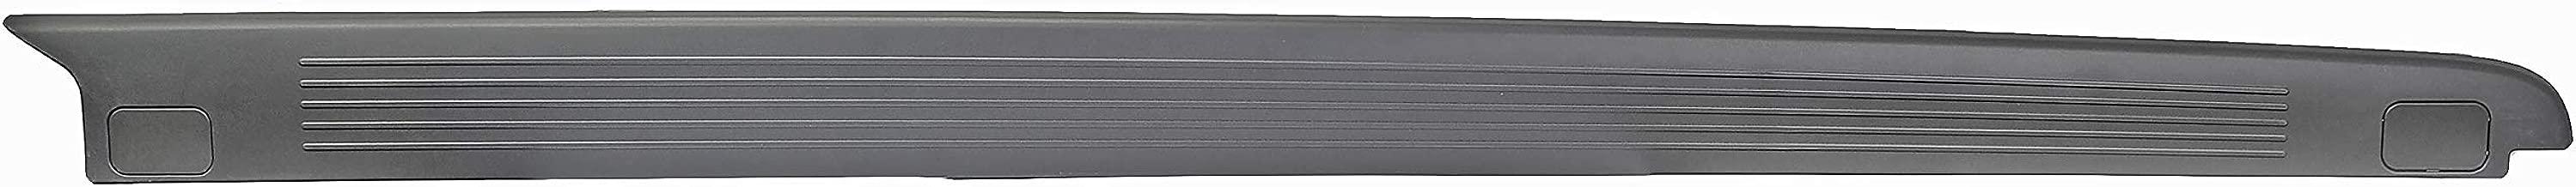 Dorman 926-934 Passenger Side 6.5 Foot Bed Rail Cover for Select Ford F-150 Models